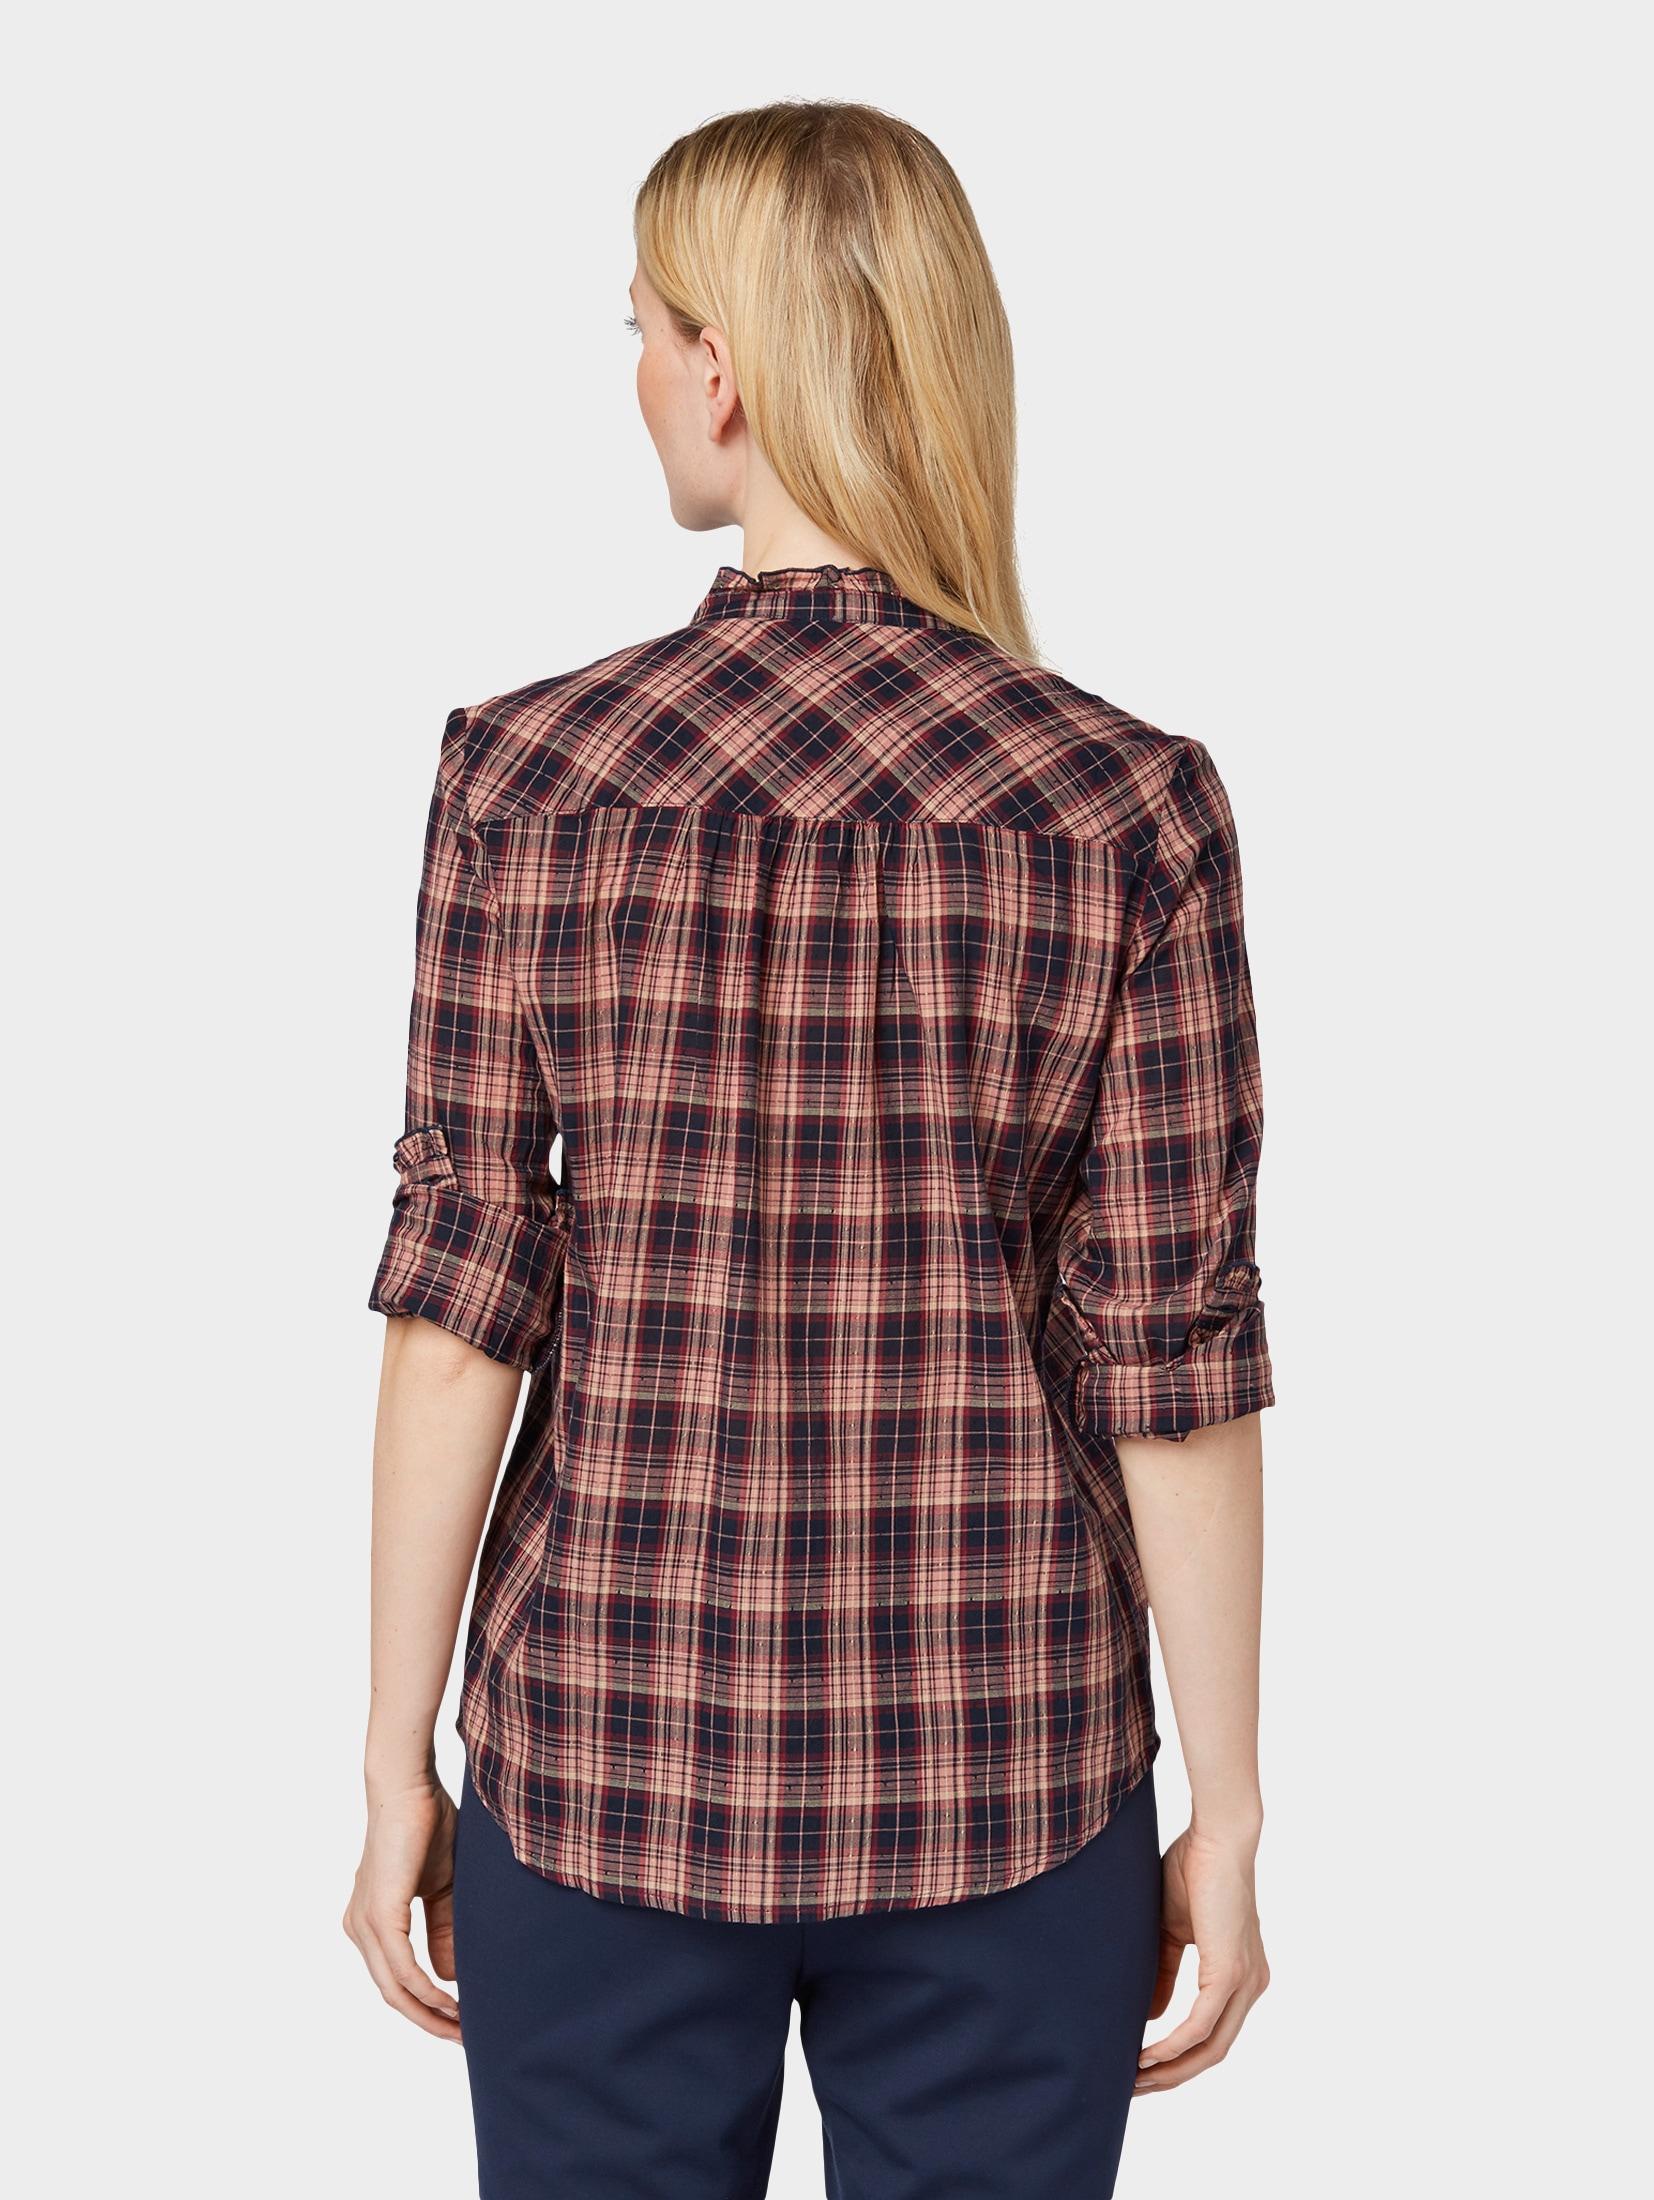 tom tailor -  Hemdbluse Bluse mit strukturiertem Karomuster